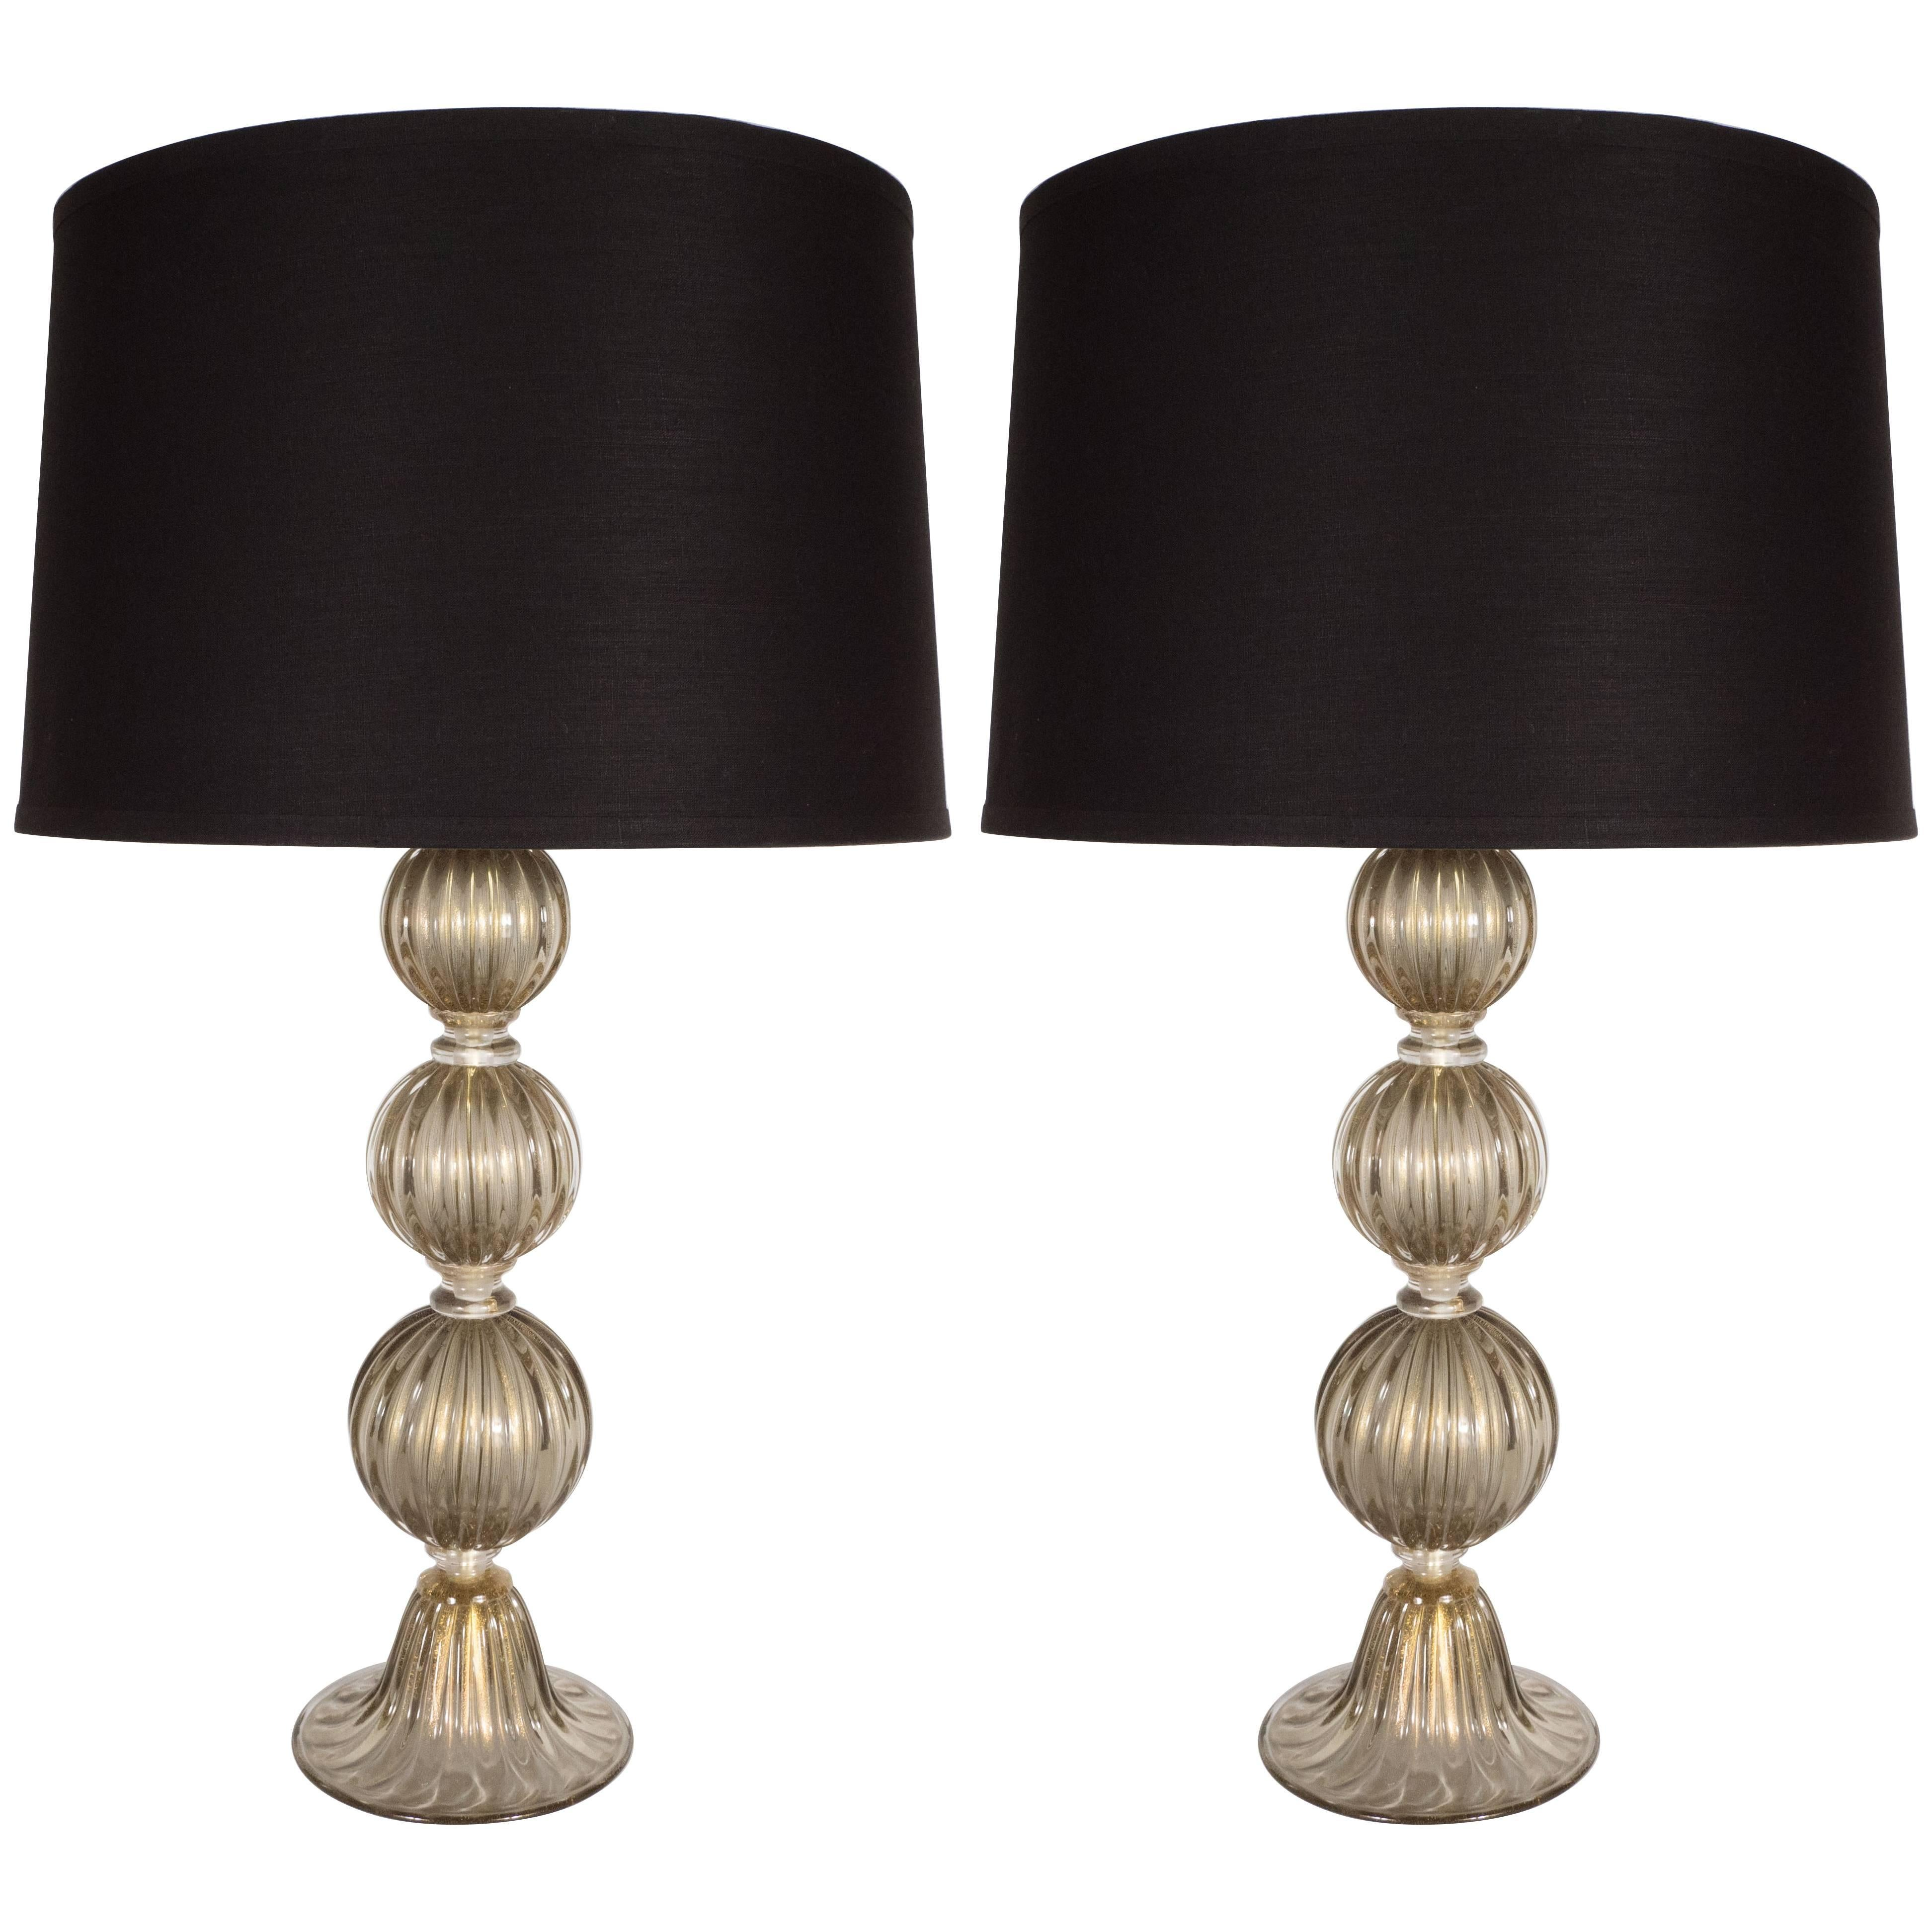 Pair of Modernist Handblown Murano Smoked Glass Table Lamps, 24kt Gold Flecks